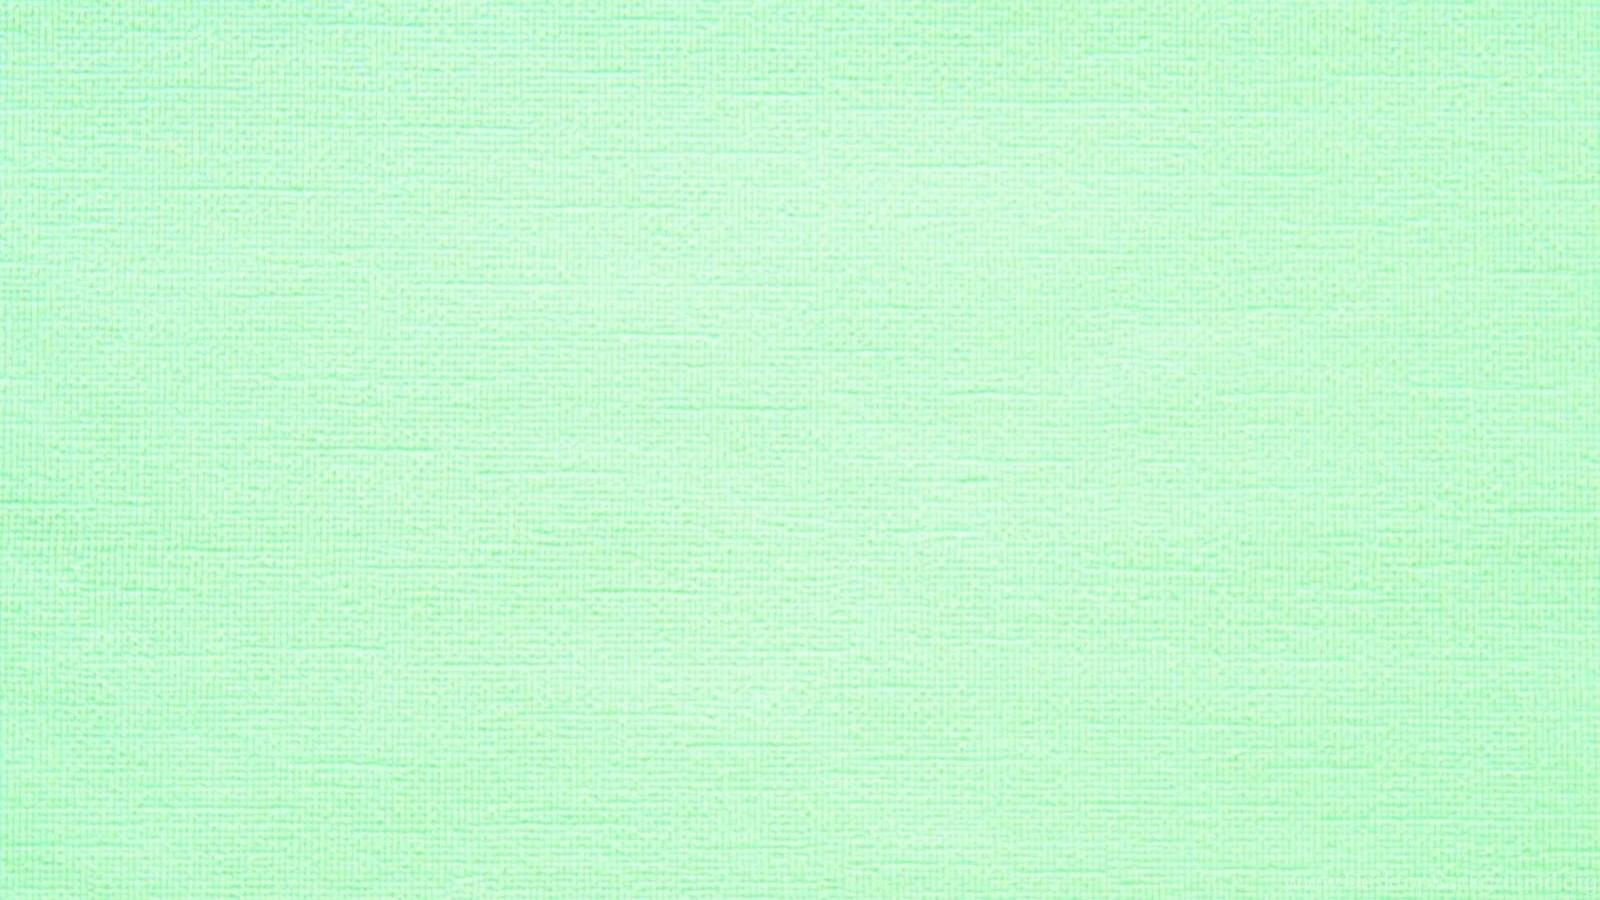 Wallpapers Panels Marburg 51509 Plain Mint Green Non woven ...